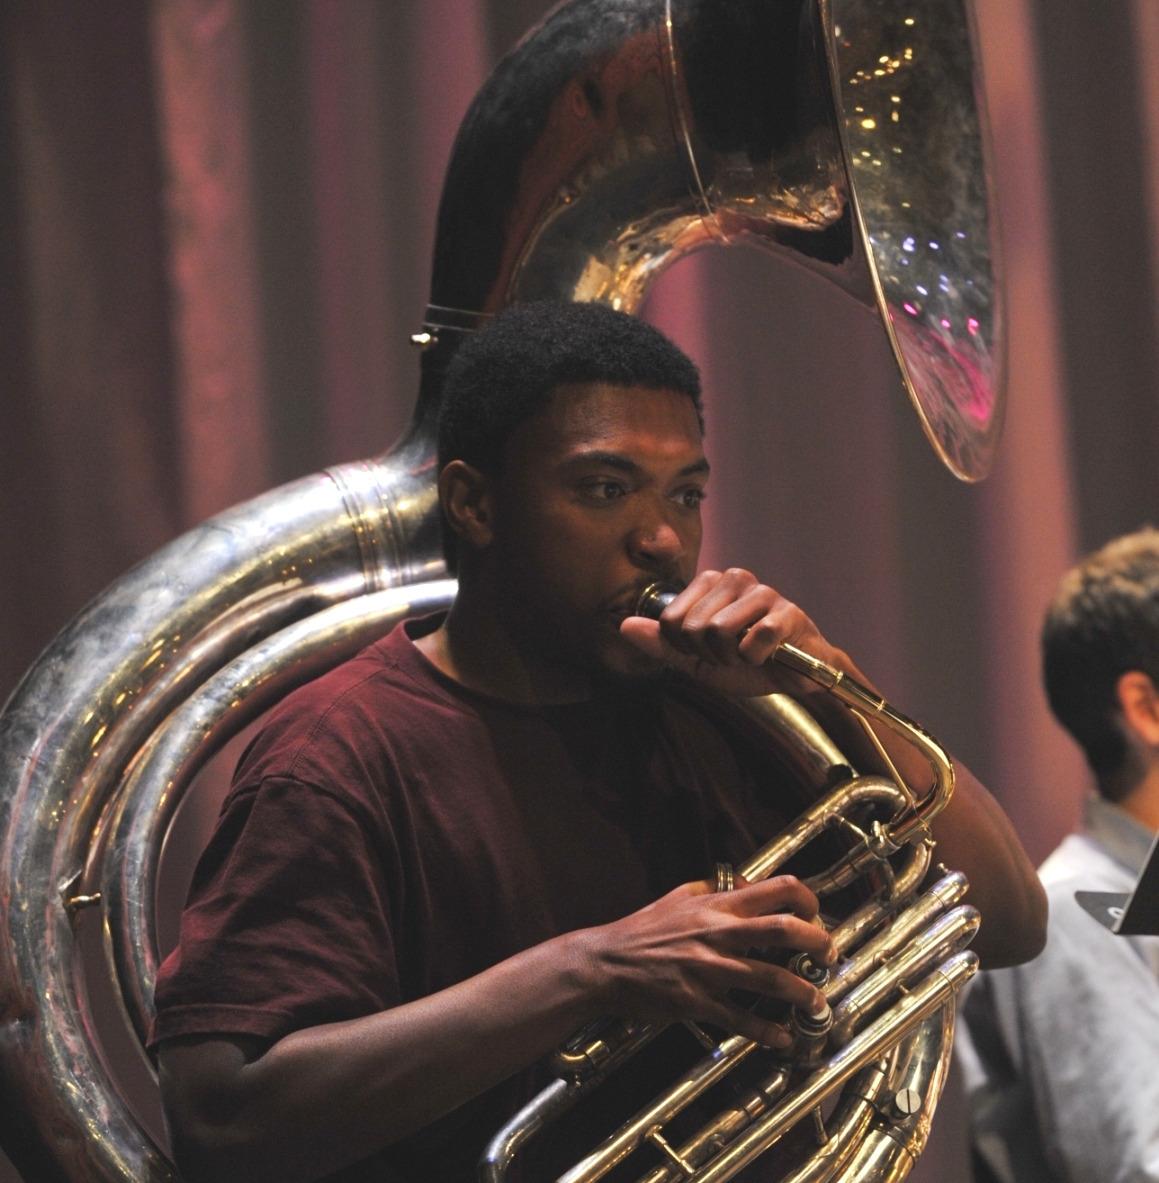 Corey Wilcox on tuba